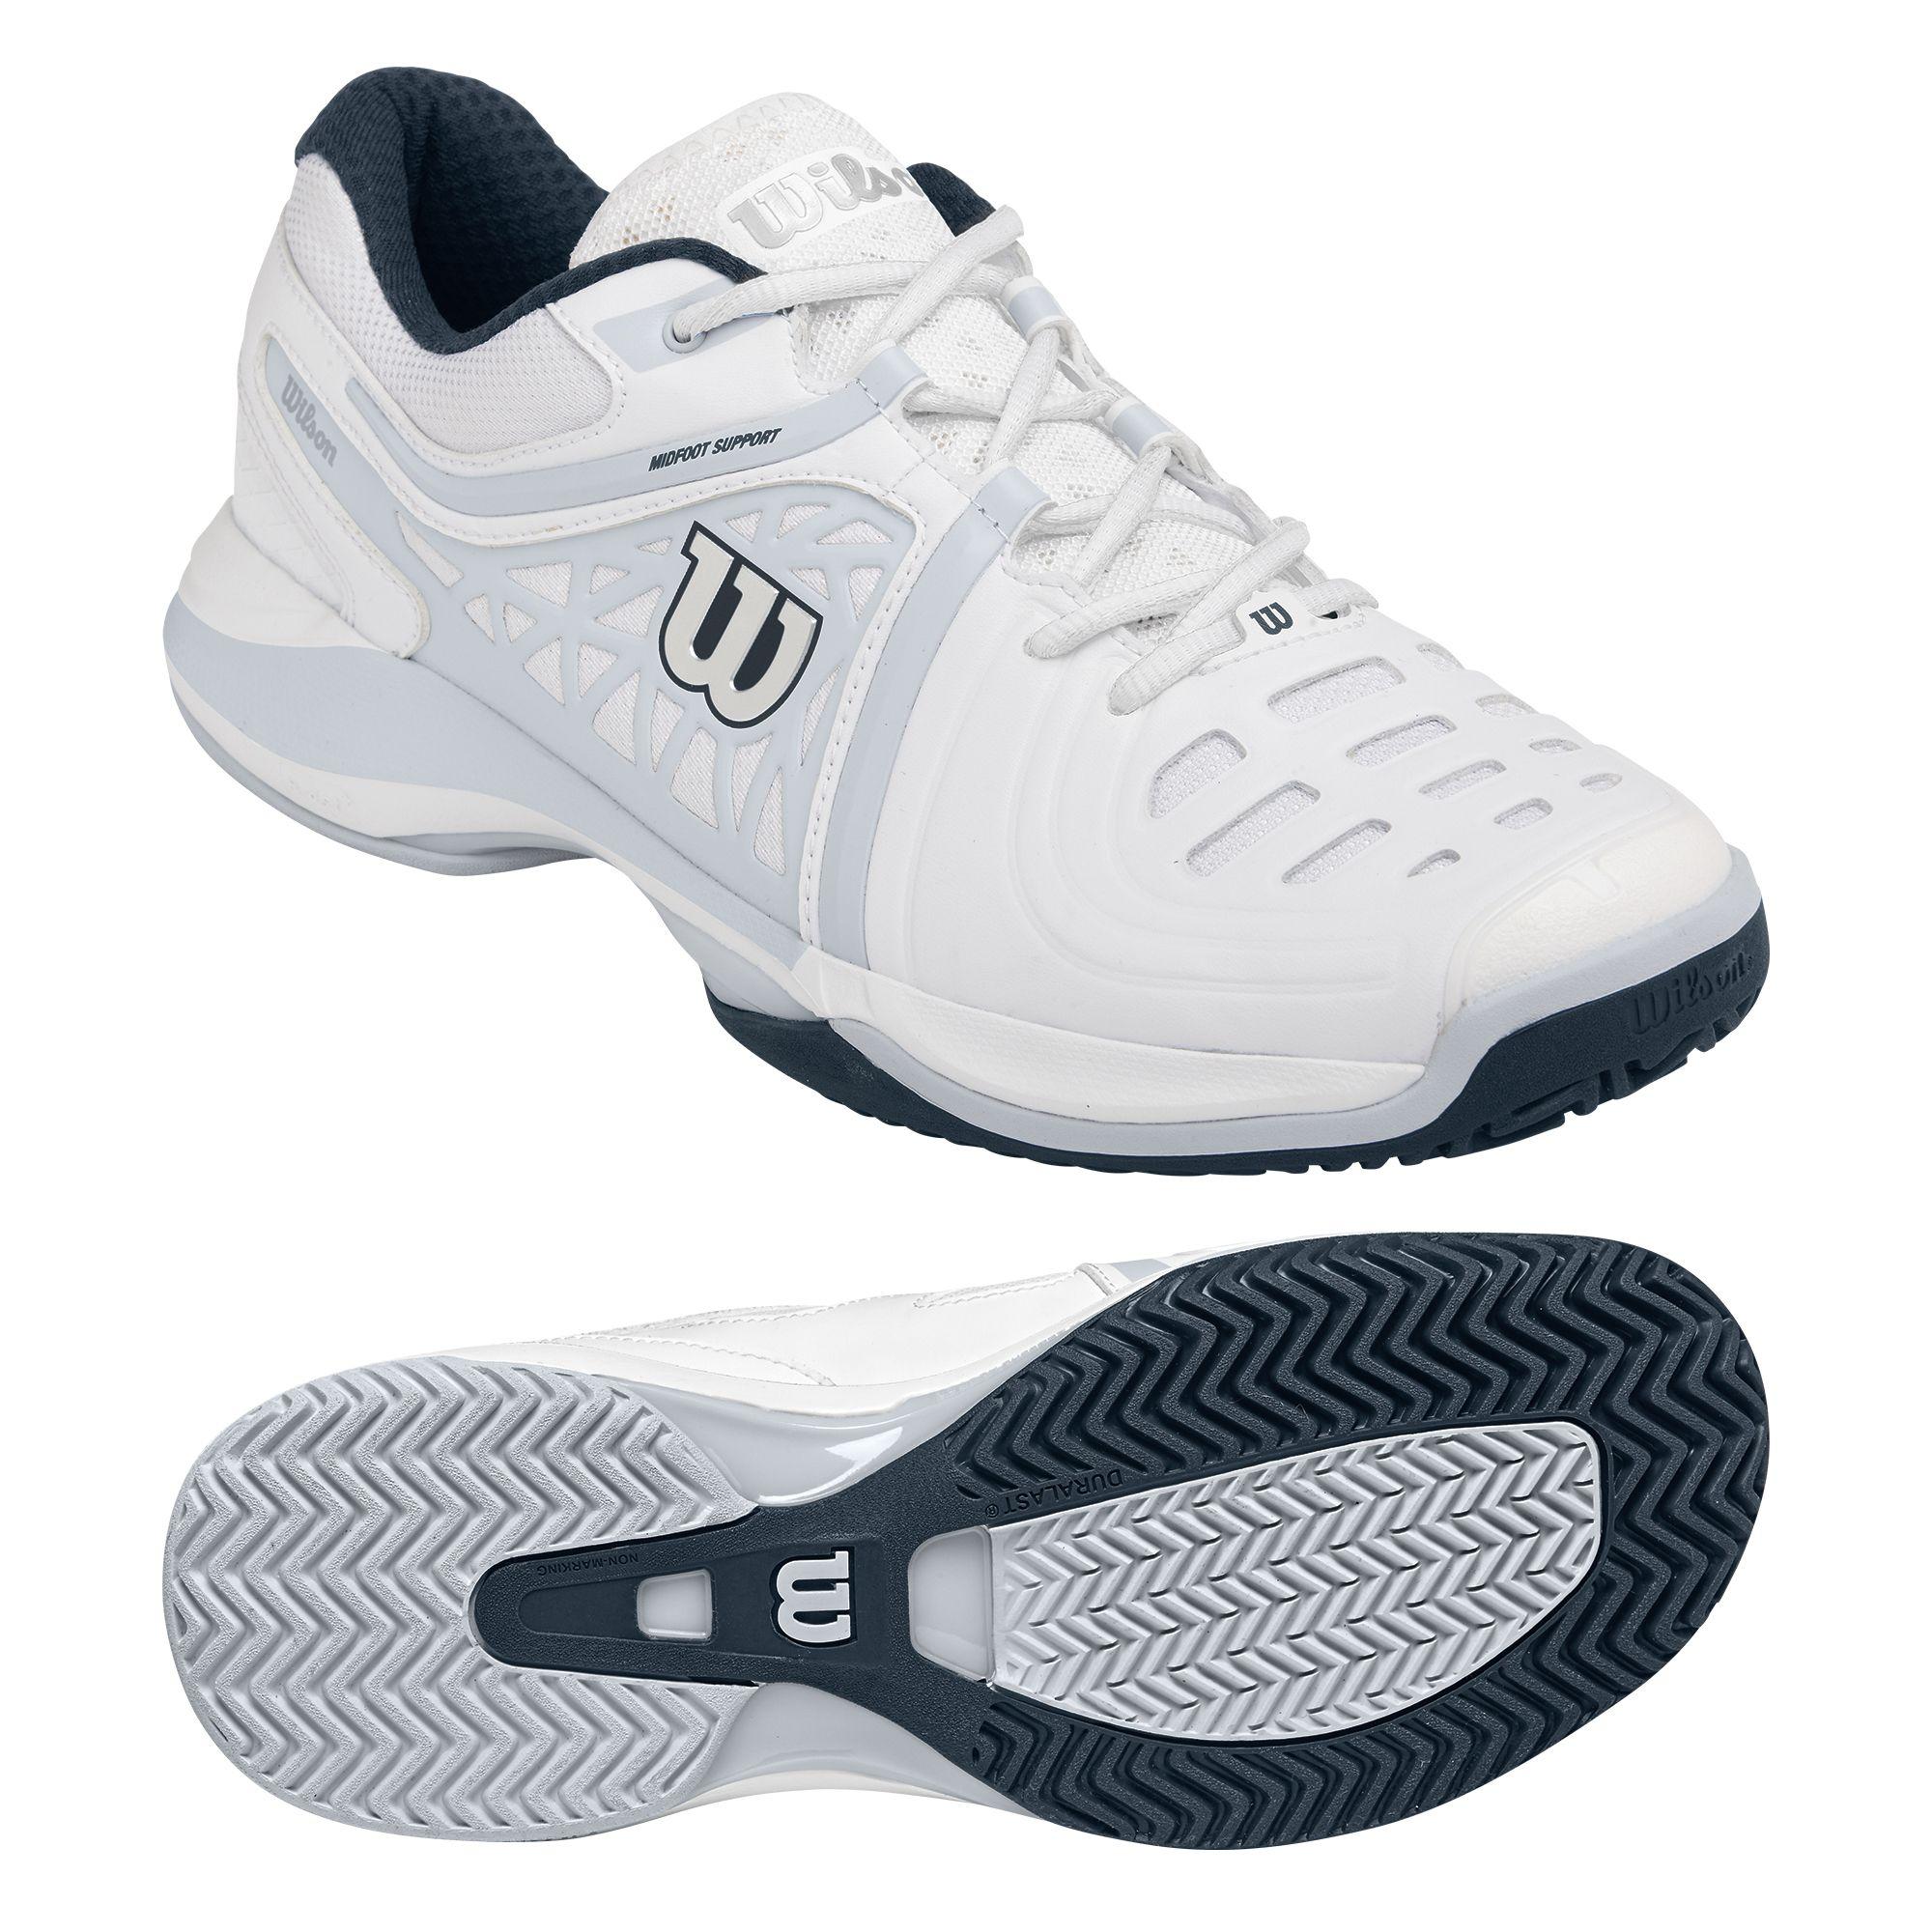 wilson nvision elite mens tennis shoes sweatband